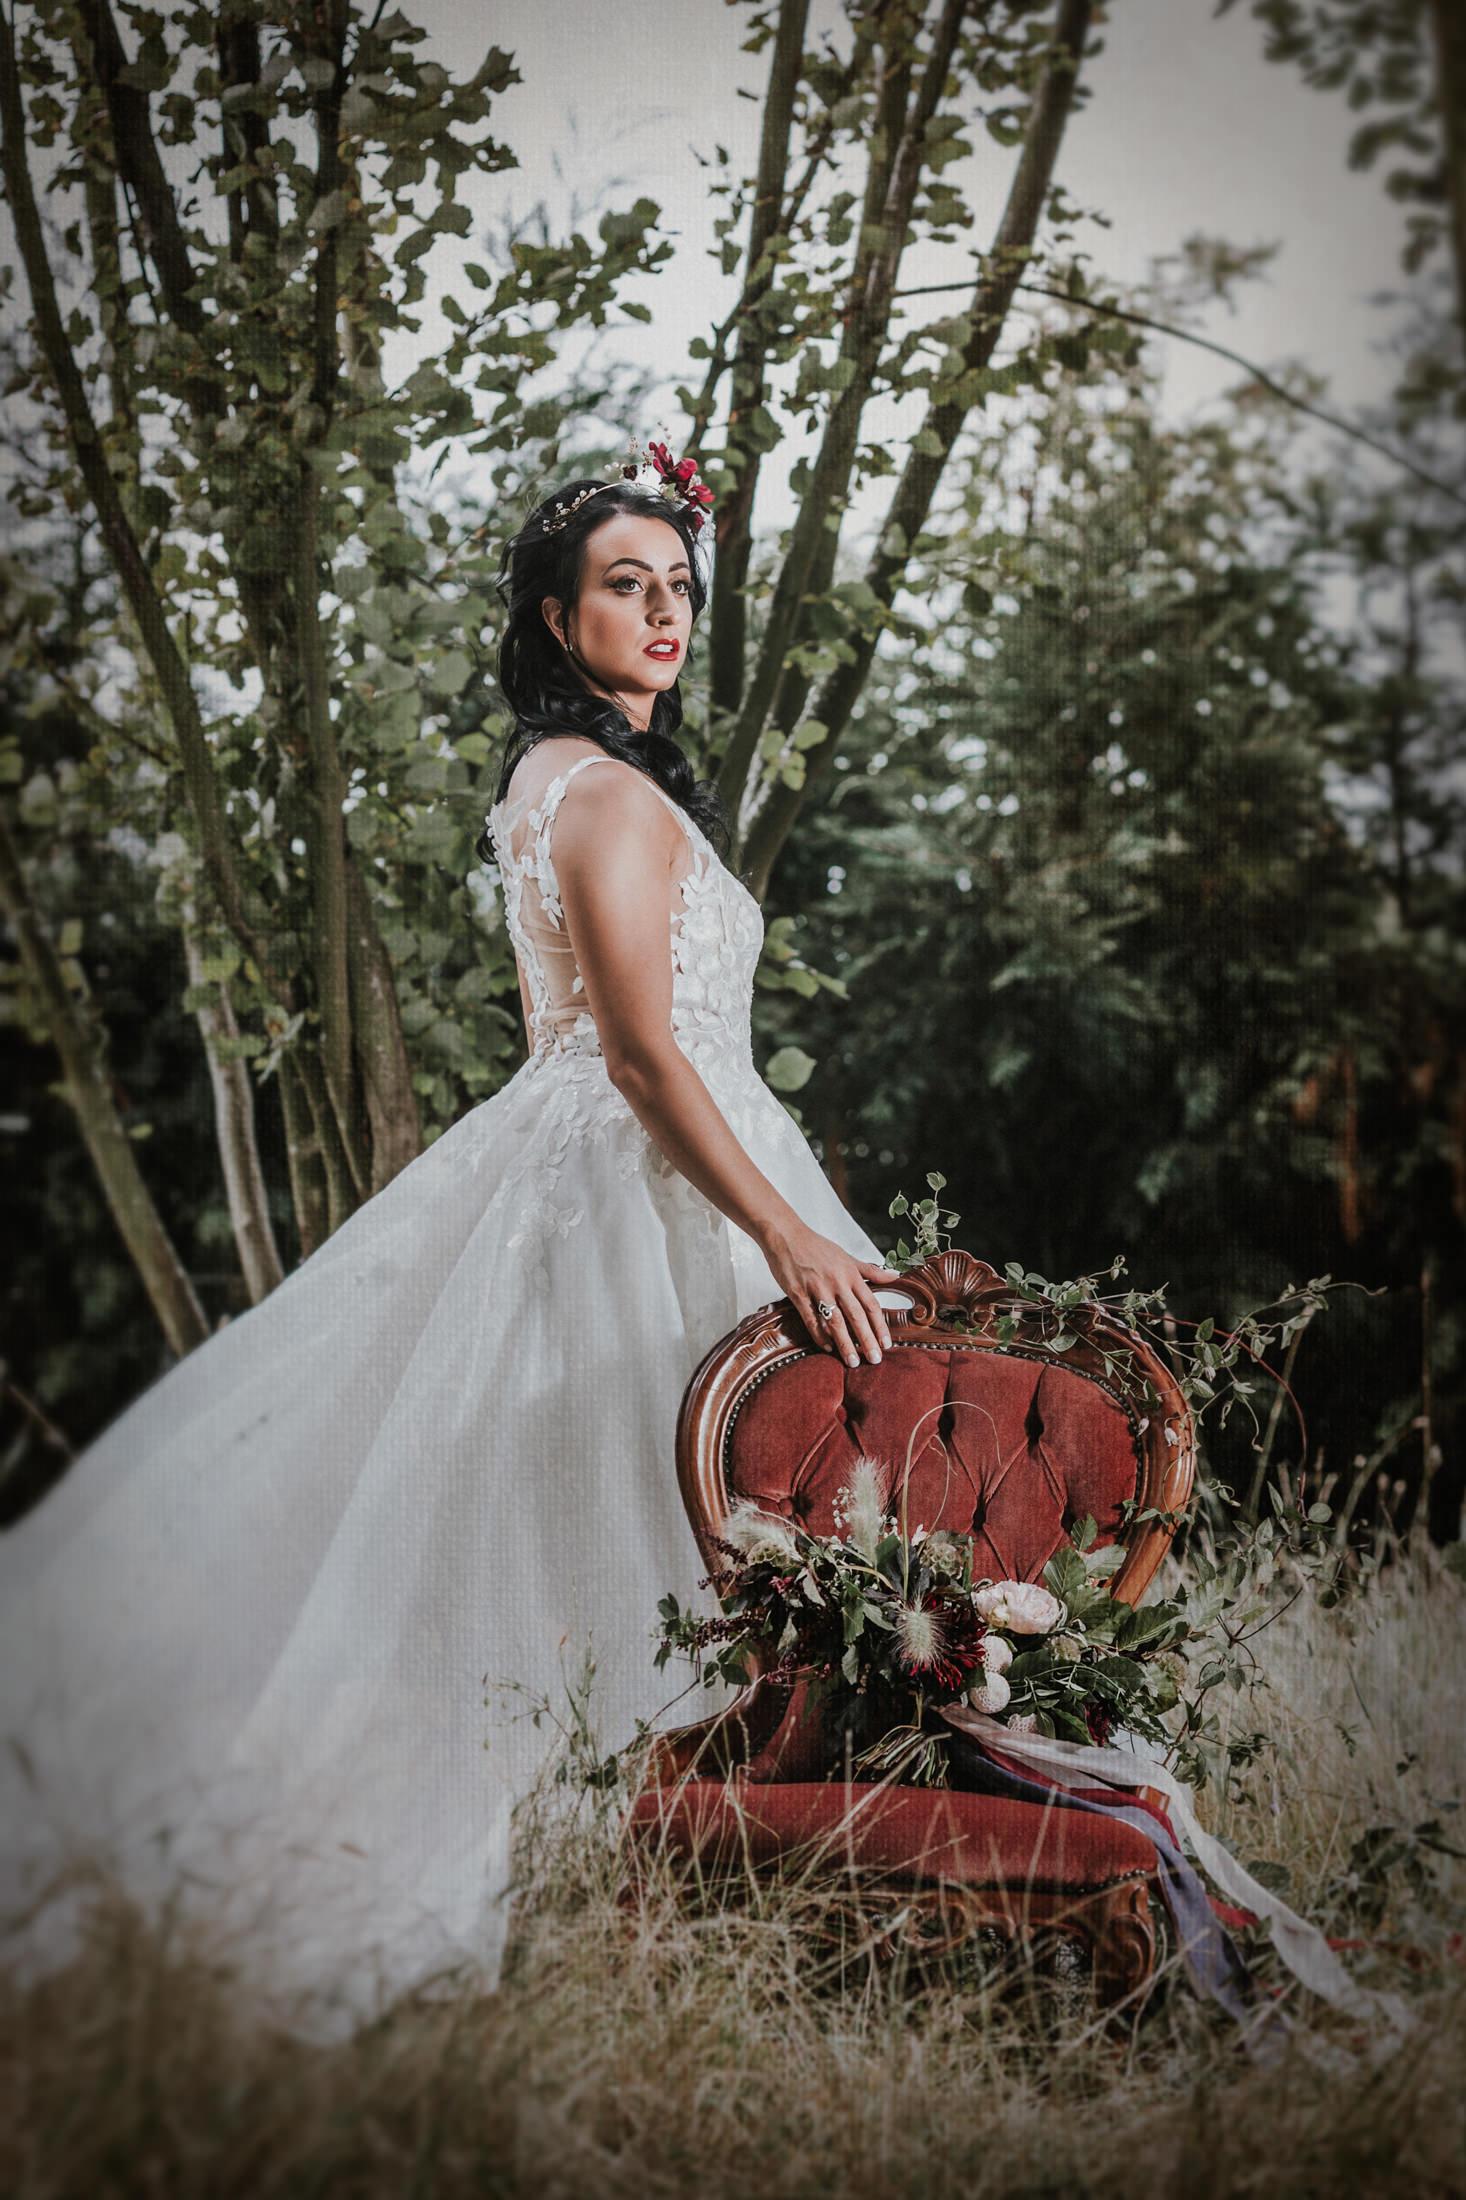 Woodland Wedding - nottingham outdoor wedding venue - east midlands wedding planner - nottingham wedding planner